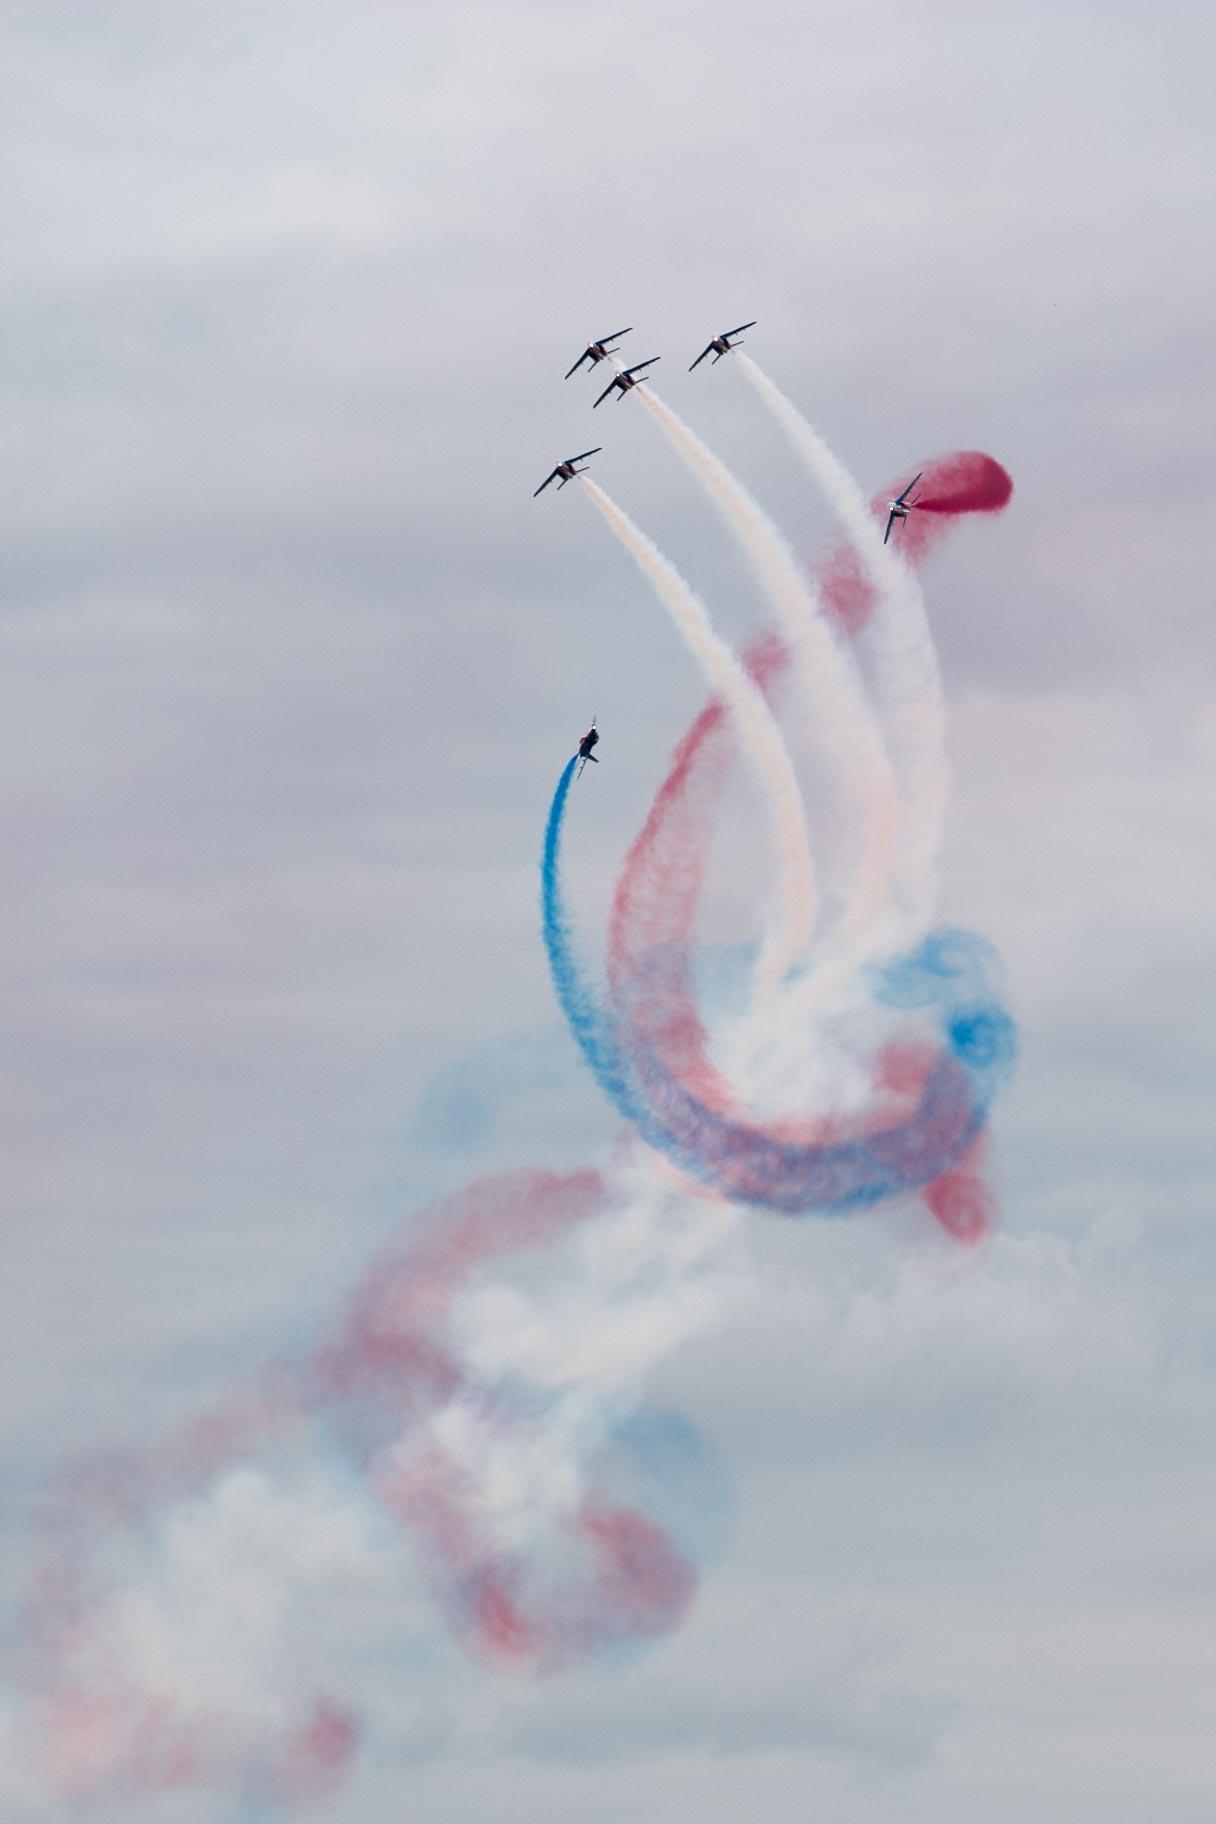 Tourbillon Bleu Blanc Rouge